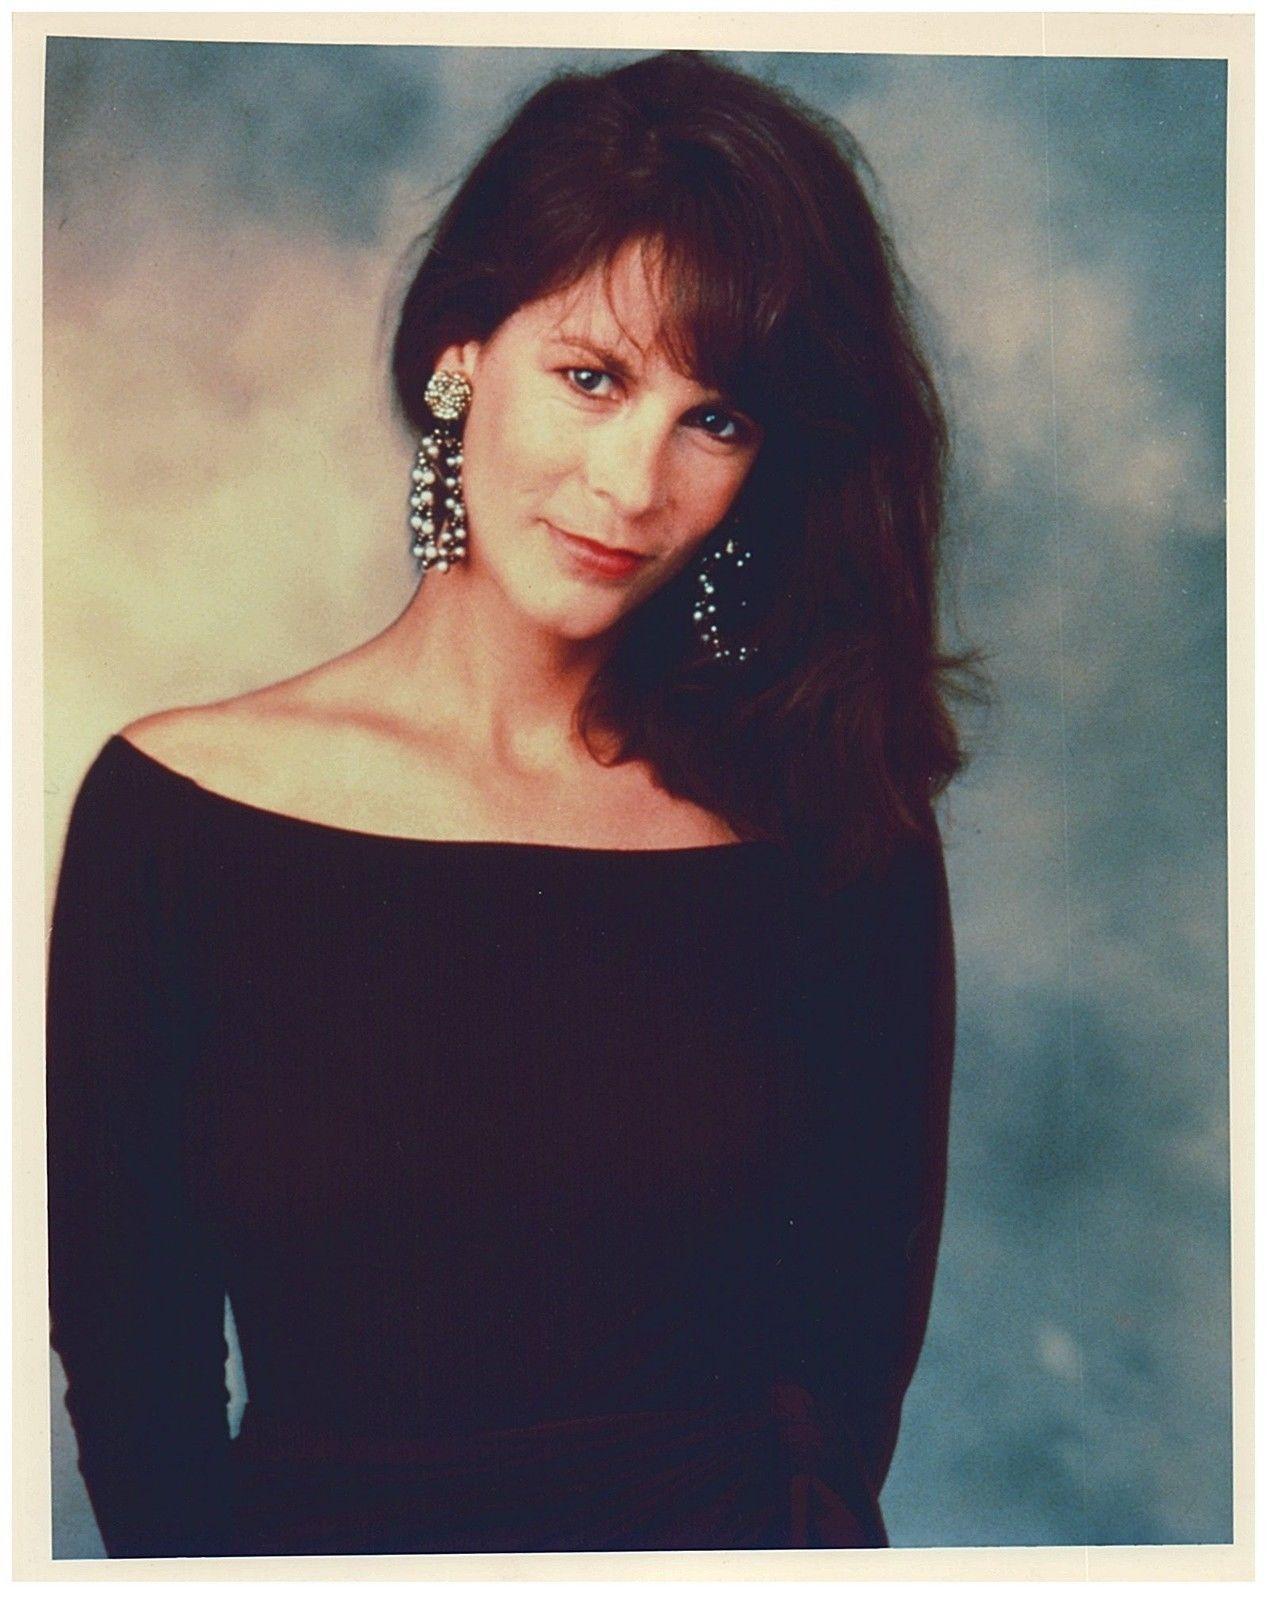 Sally Struthers photo